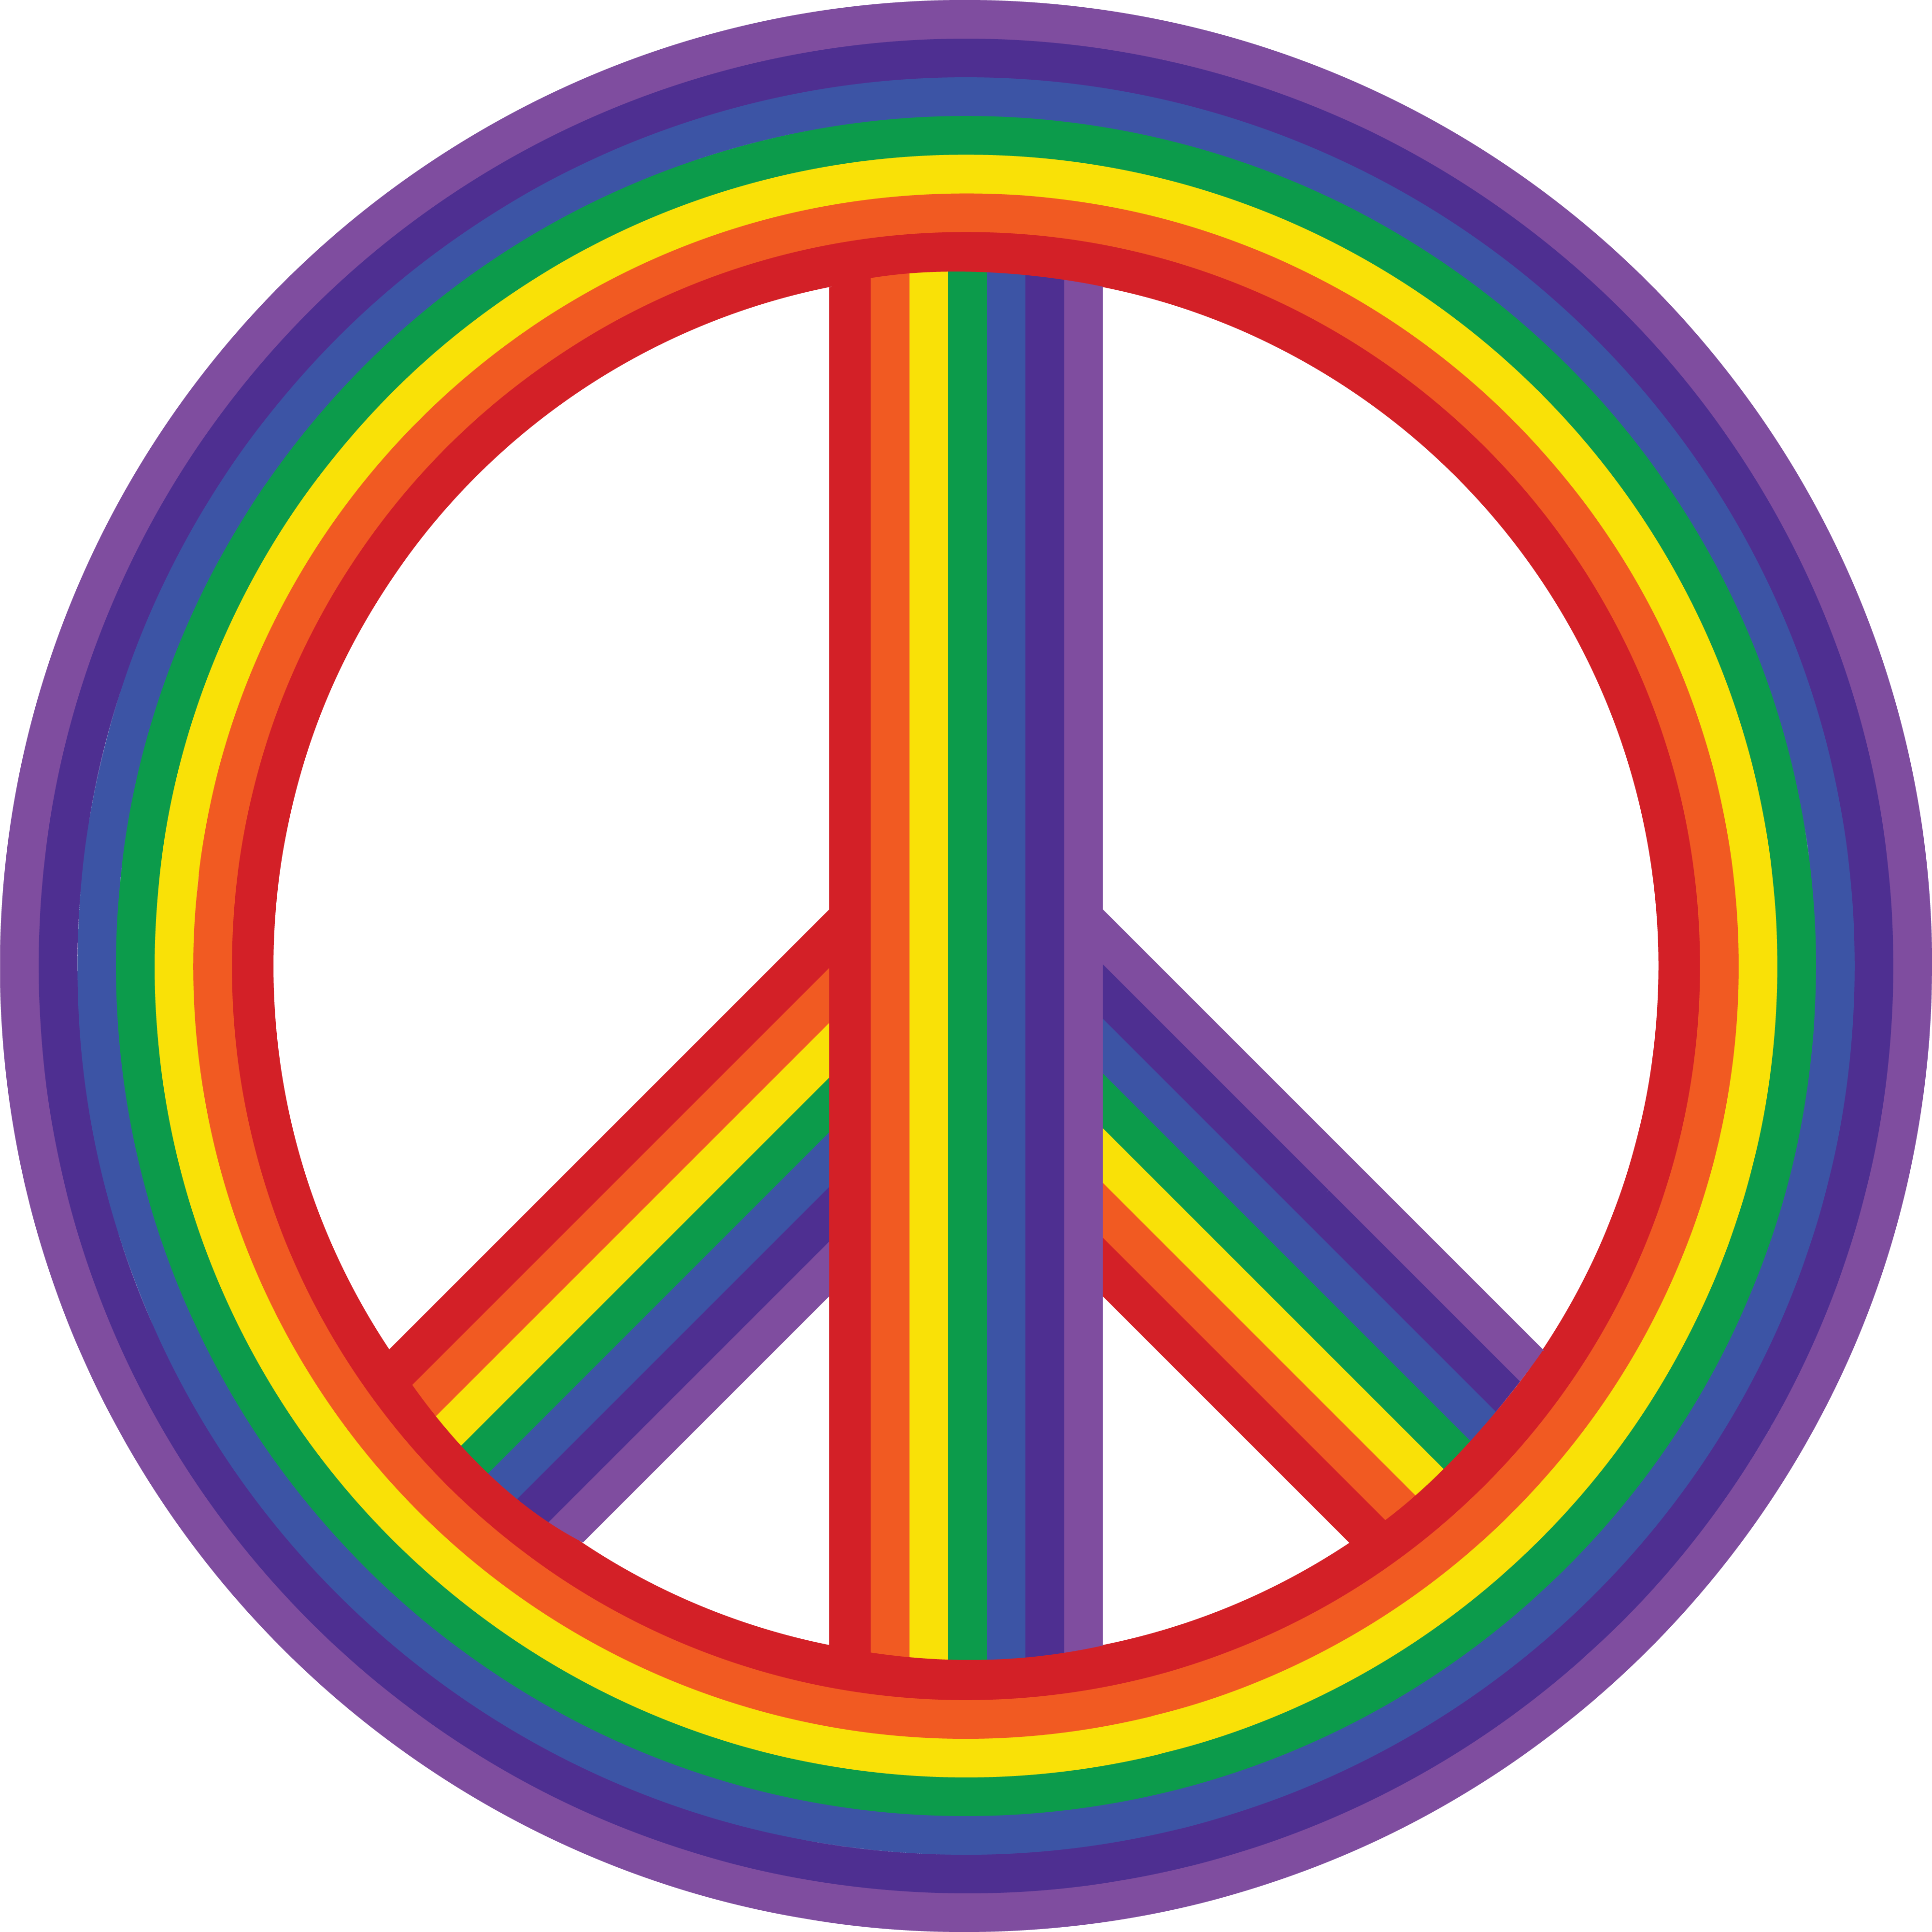 4000x4000 Free Clipart Of A Rainbow Peace Symbol